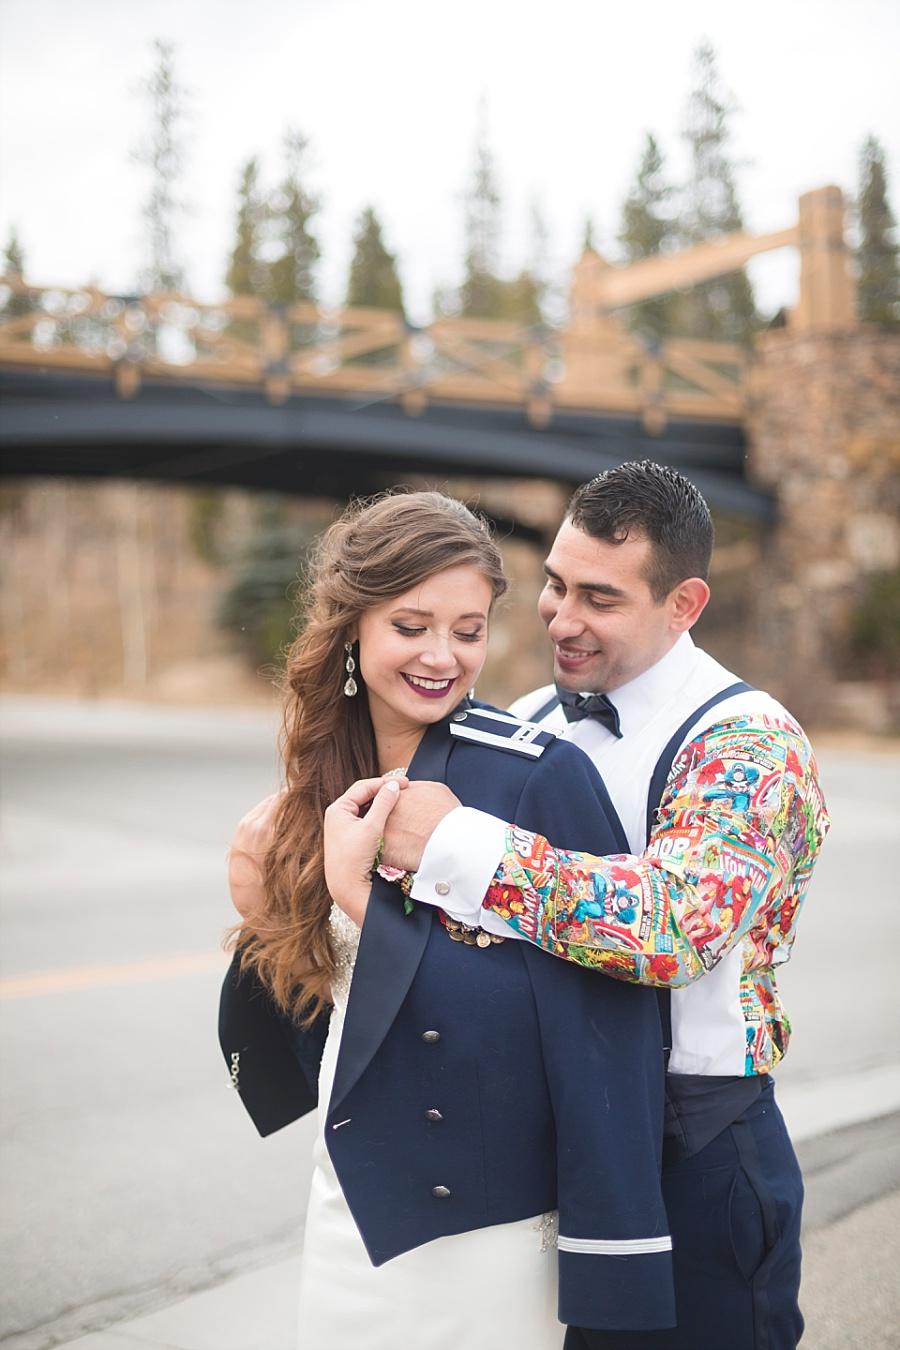 Stacy Anderson Photography Breckenridge Denver Boulder Vail Colorado Travel Lifestyle Elopement Vow renewal Family Wedding Photographer_0030.jpg